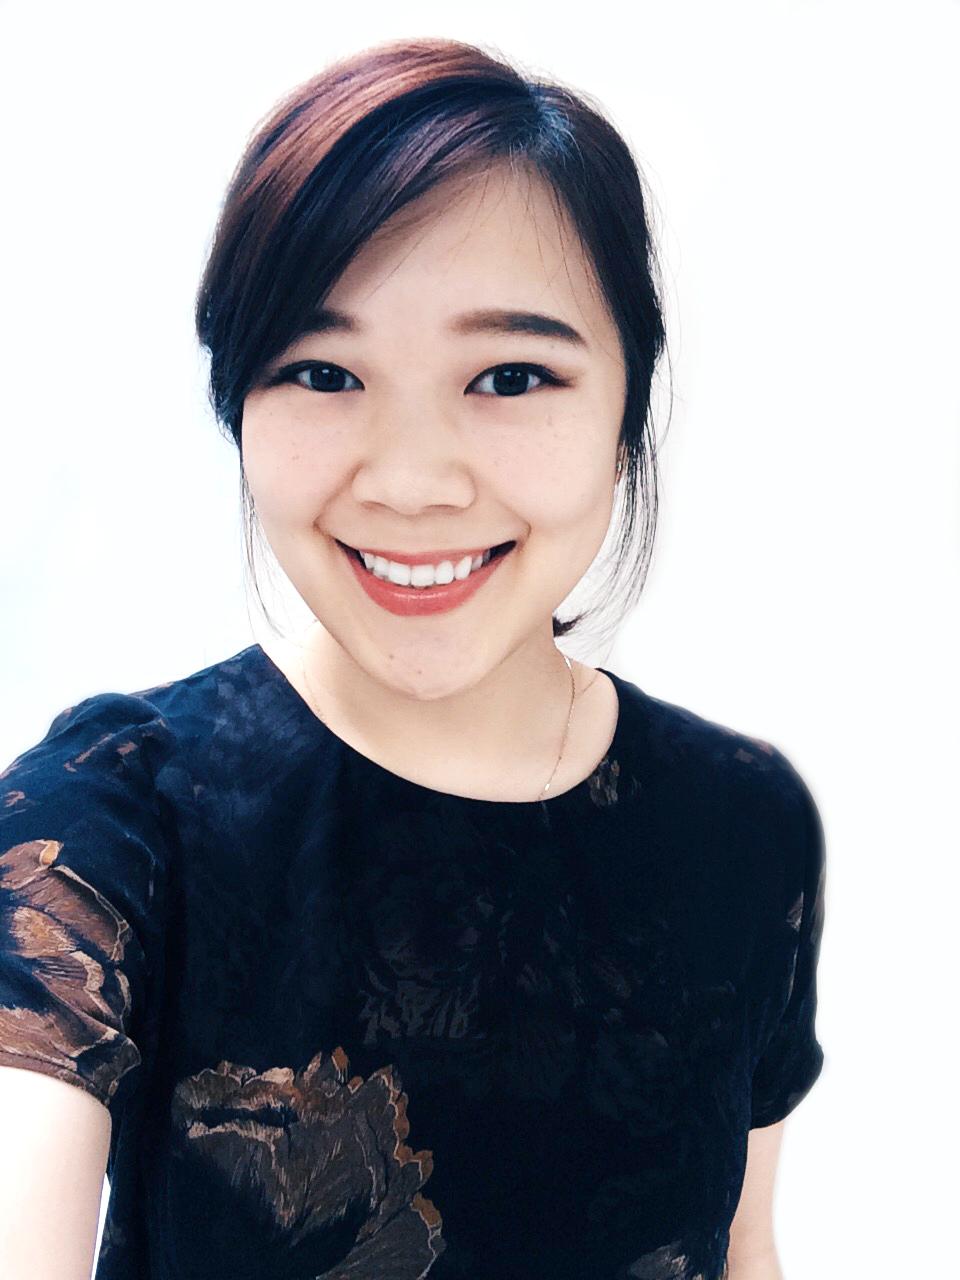 profilepic.jpg